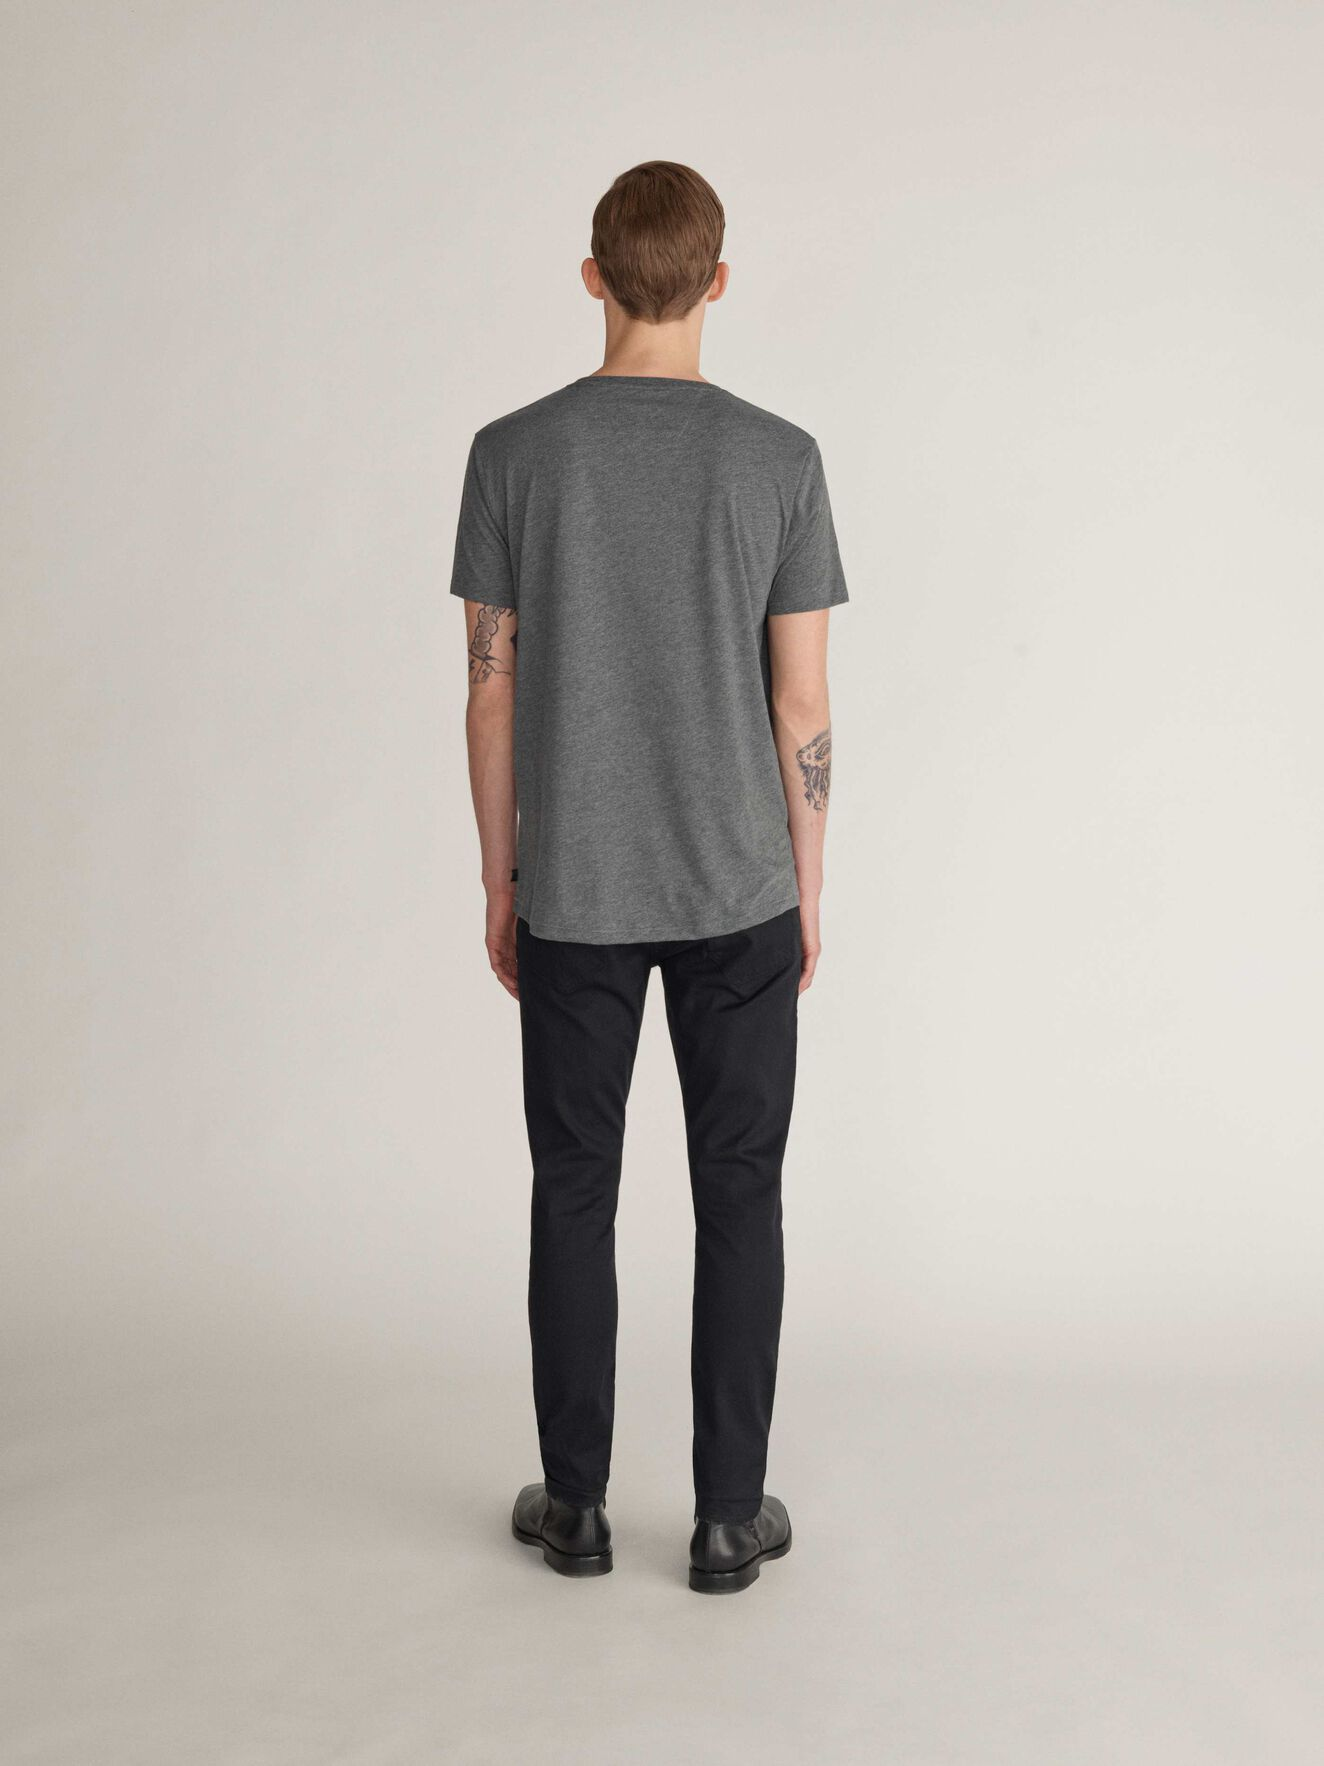 Corey Sol T-Shirt in Grey melange from Tiger of Sweden